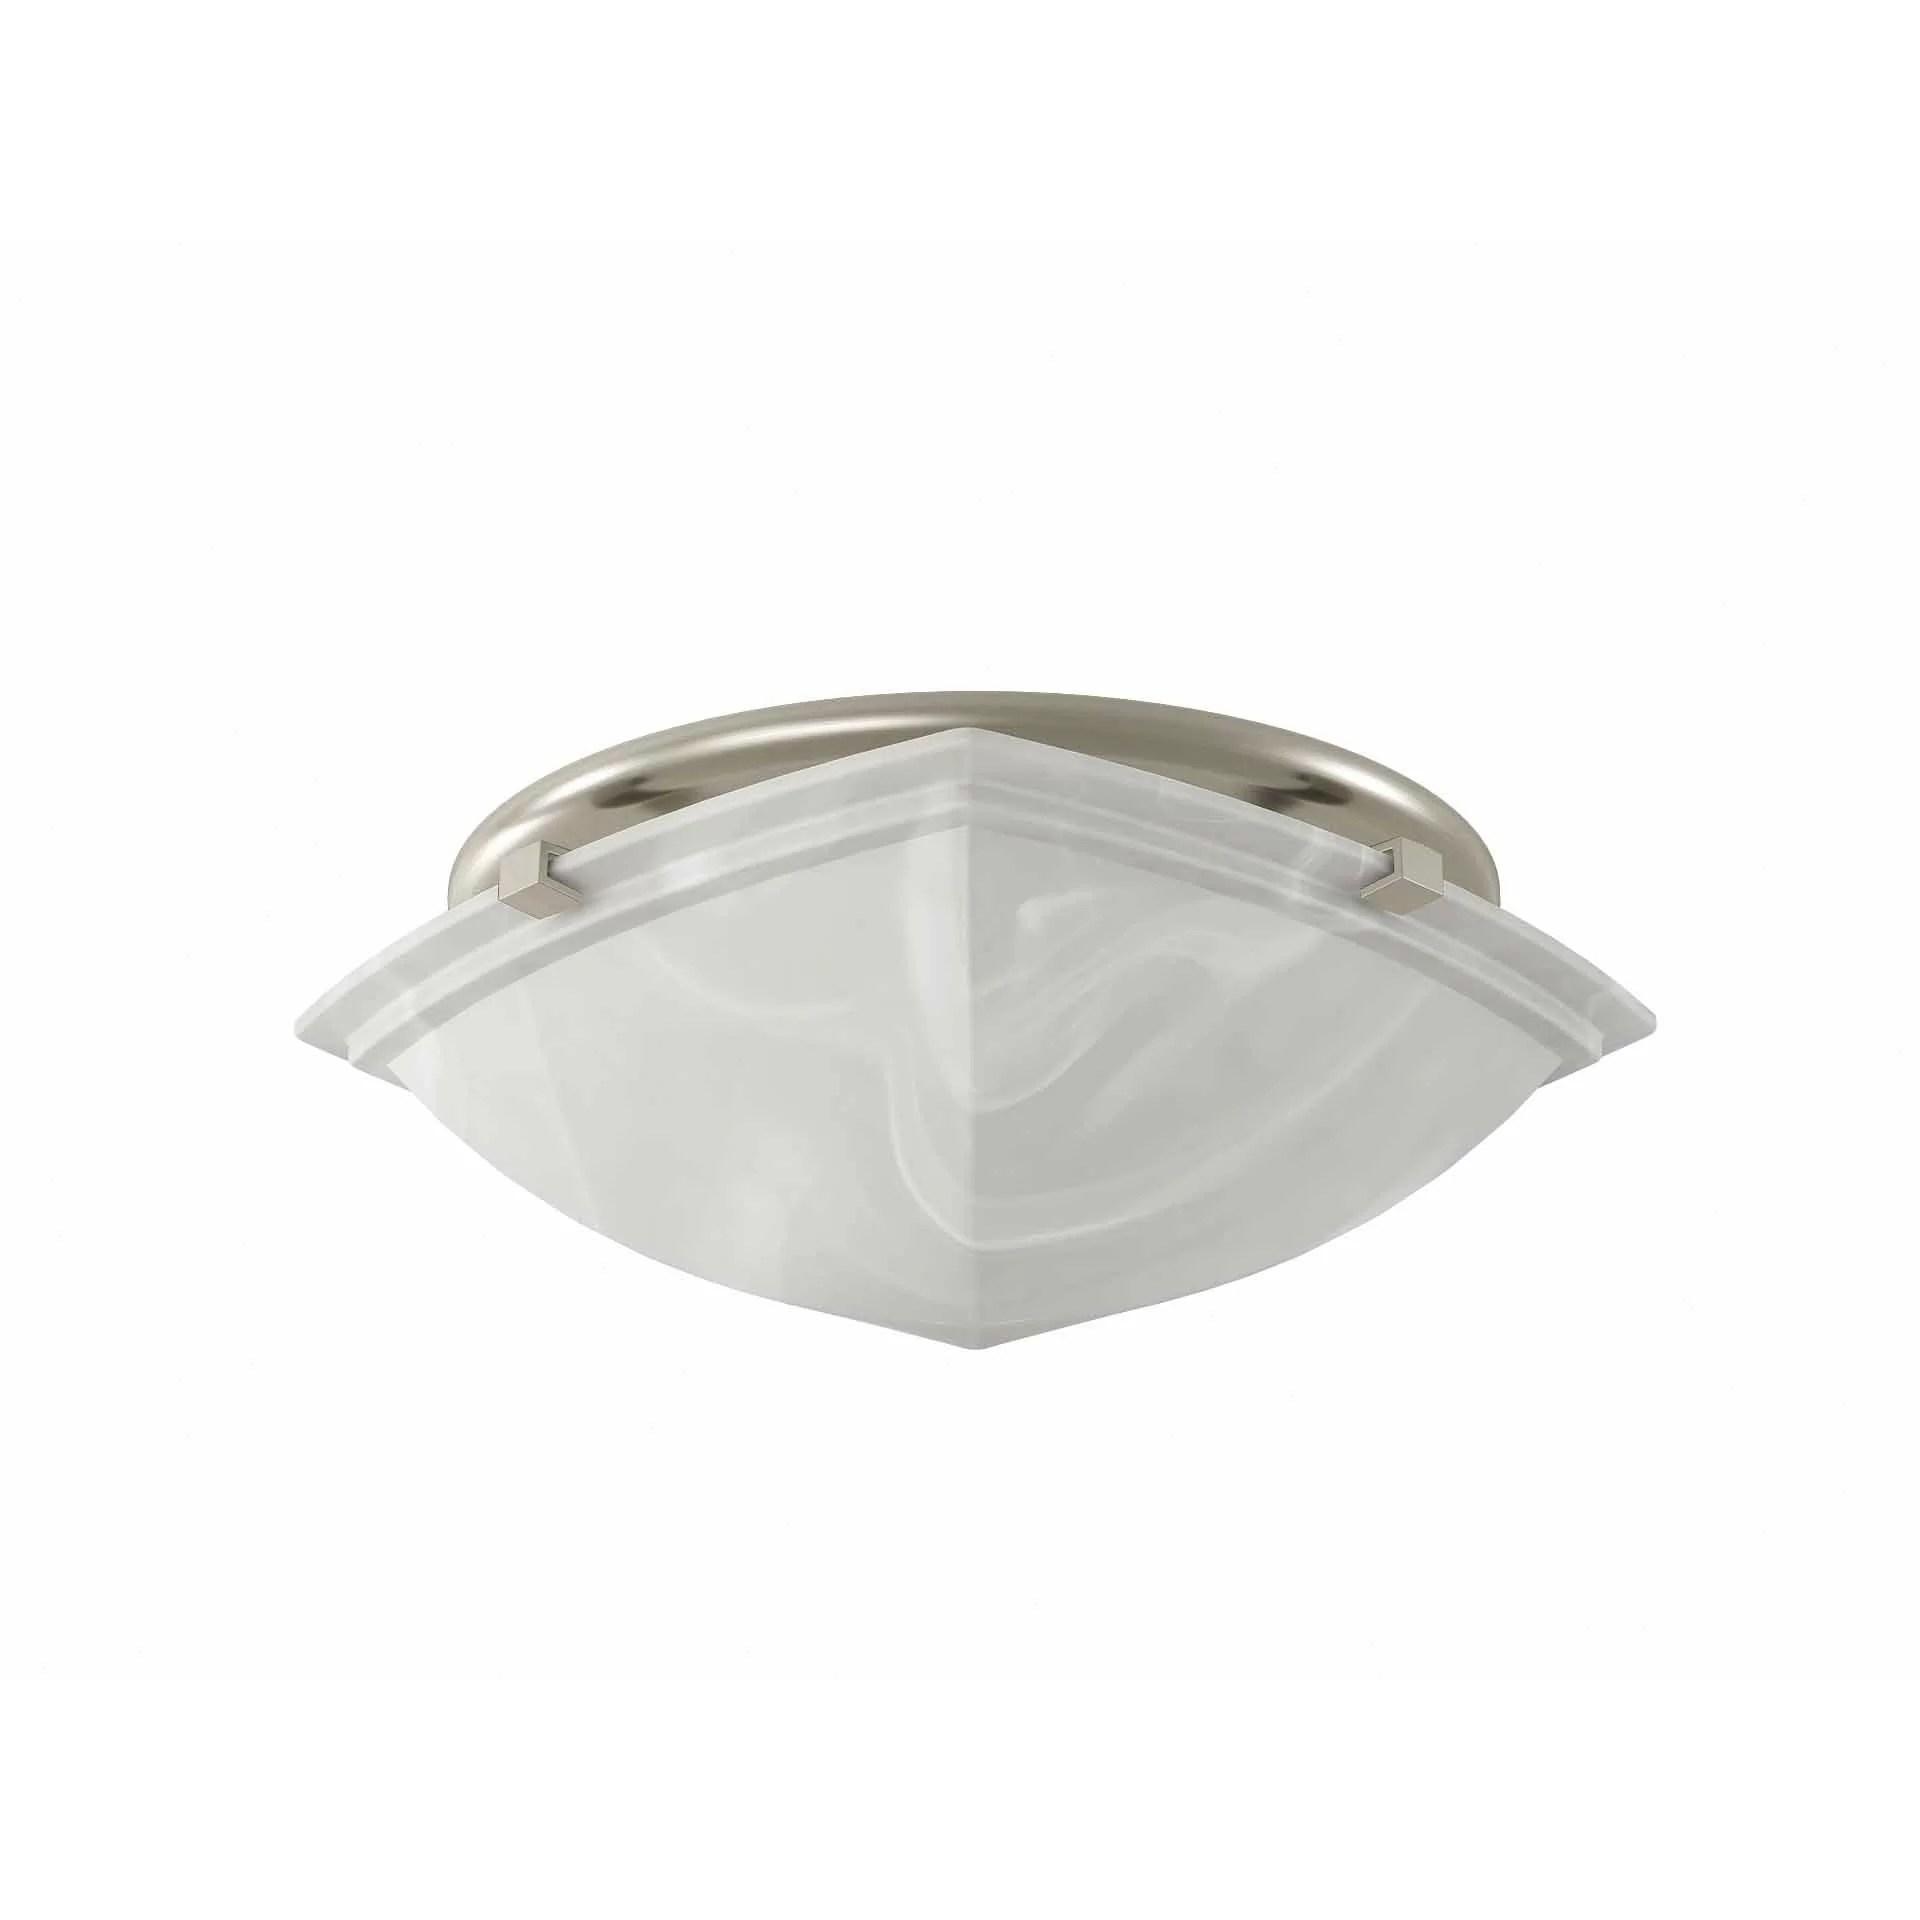 Broan 80 CFM Bathroom Fan with Light & Reviews